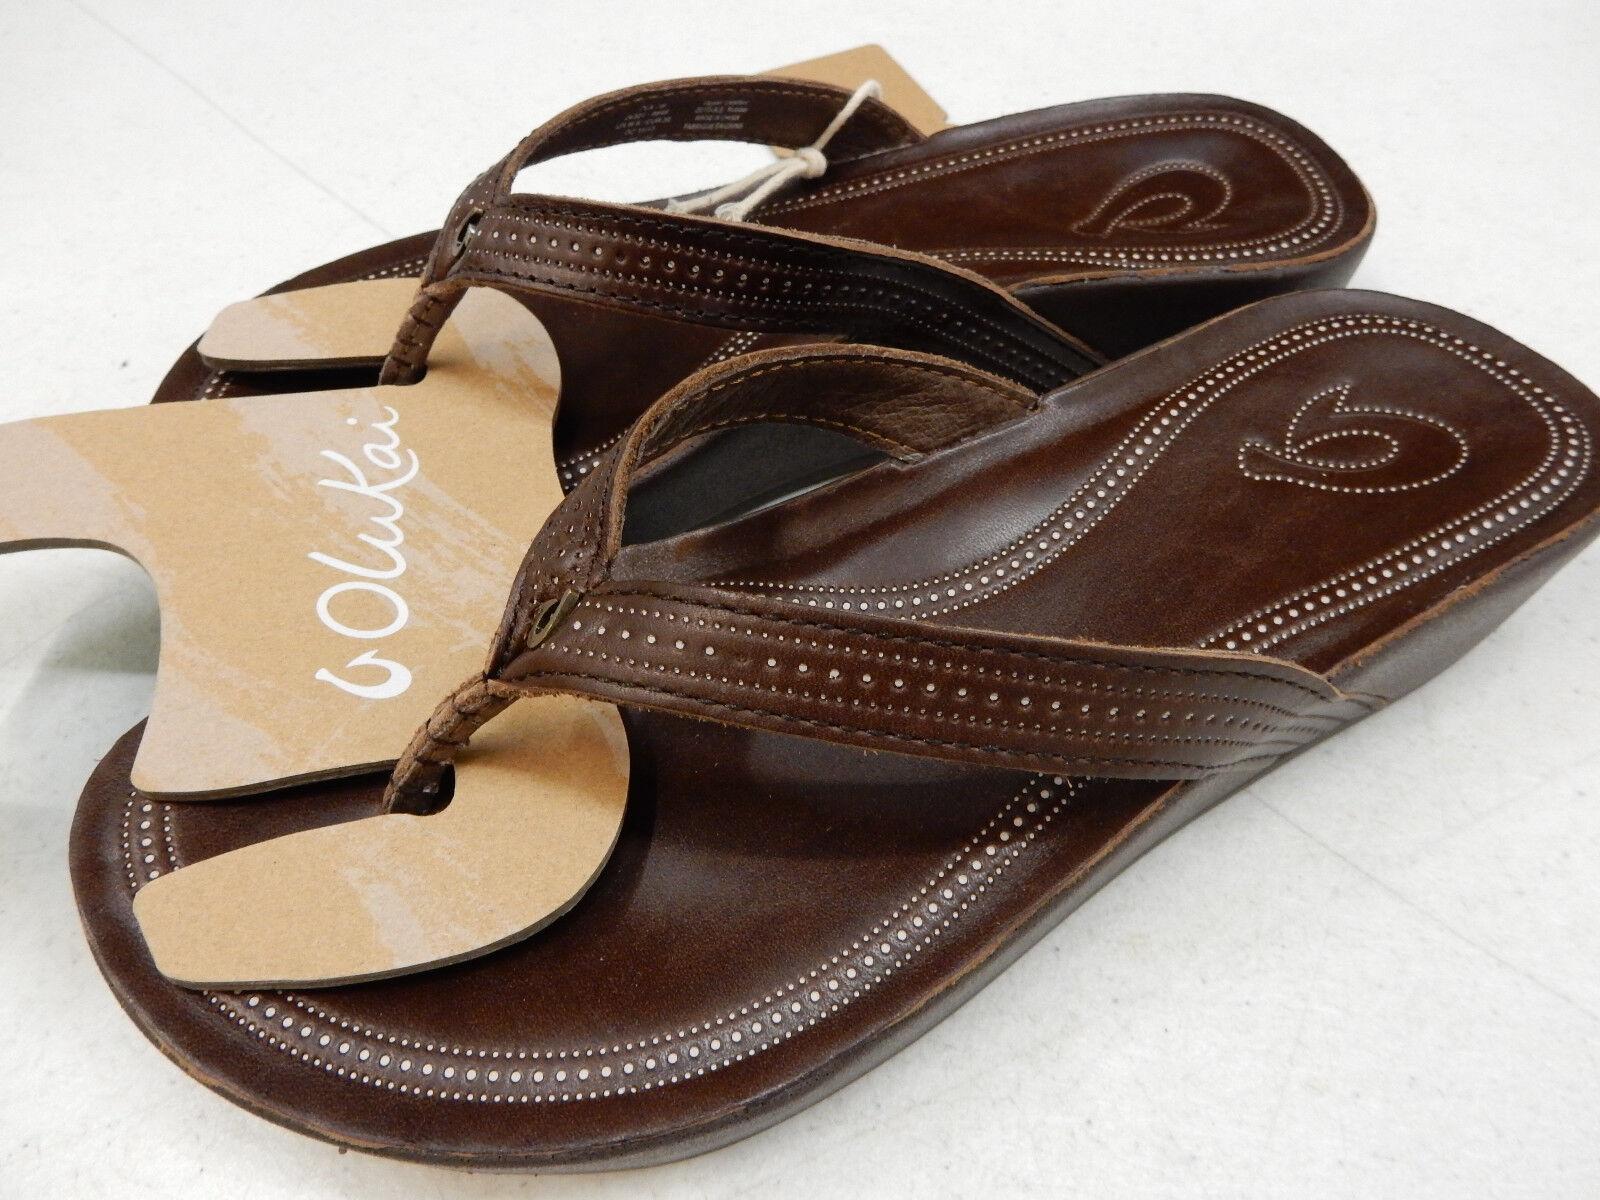 297d4b80e2bbba Buy OluKai Womens Sandals Ola Dark Java Size 9 online